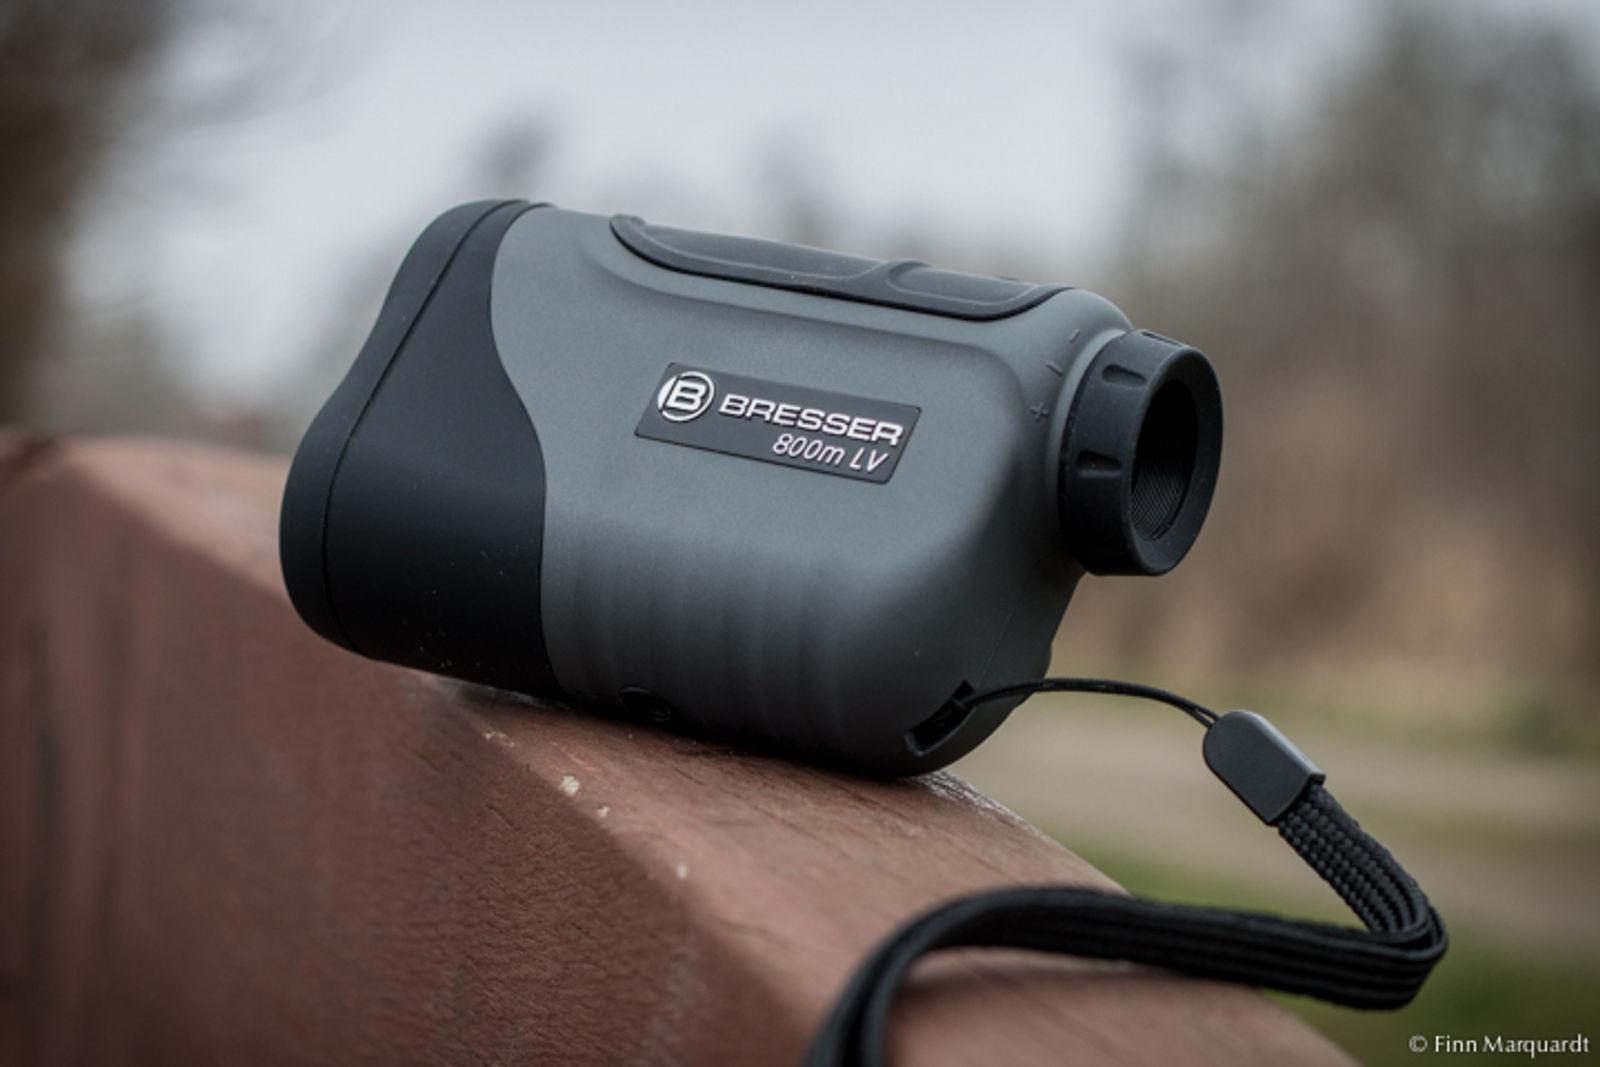 Test Bresser Entfernungsmesser : Entfernungsmesser m lv laserentfernungsmesser von bresser